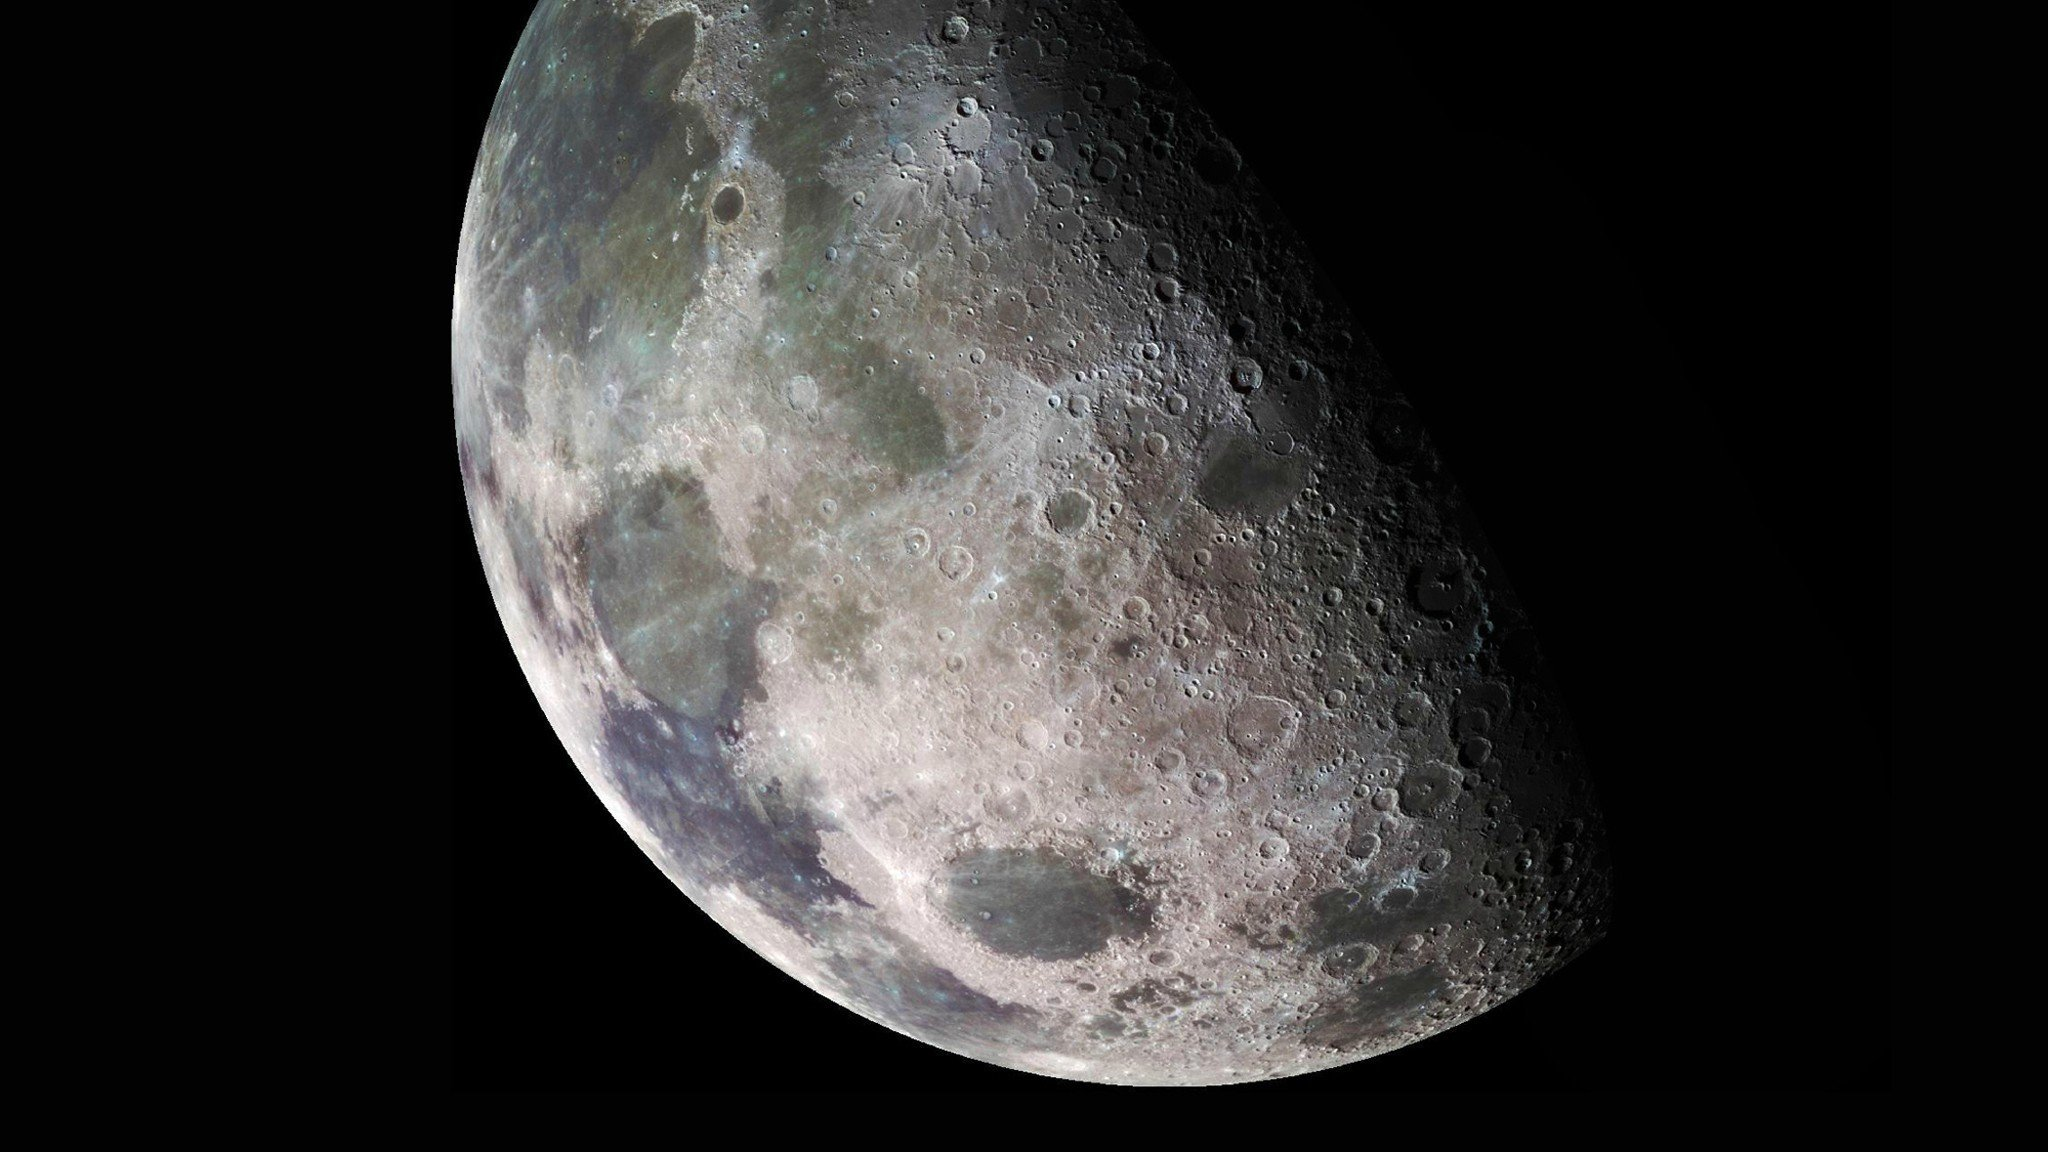 Closeup moon moonlight texture hd wallpapers desktop - Moon close up ...